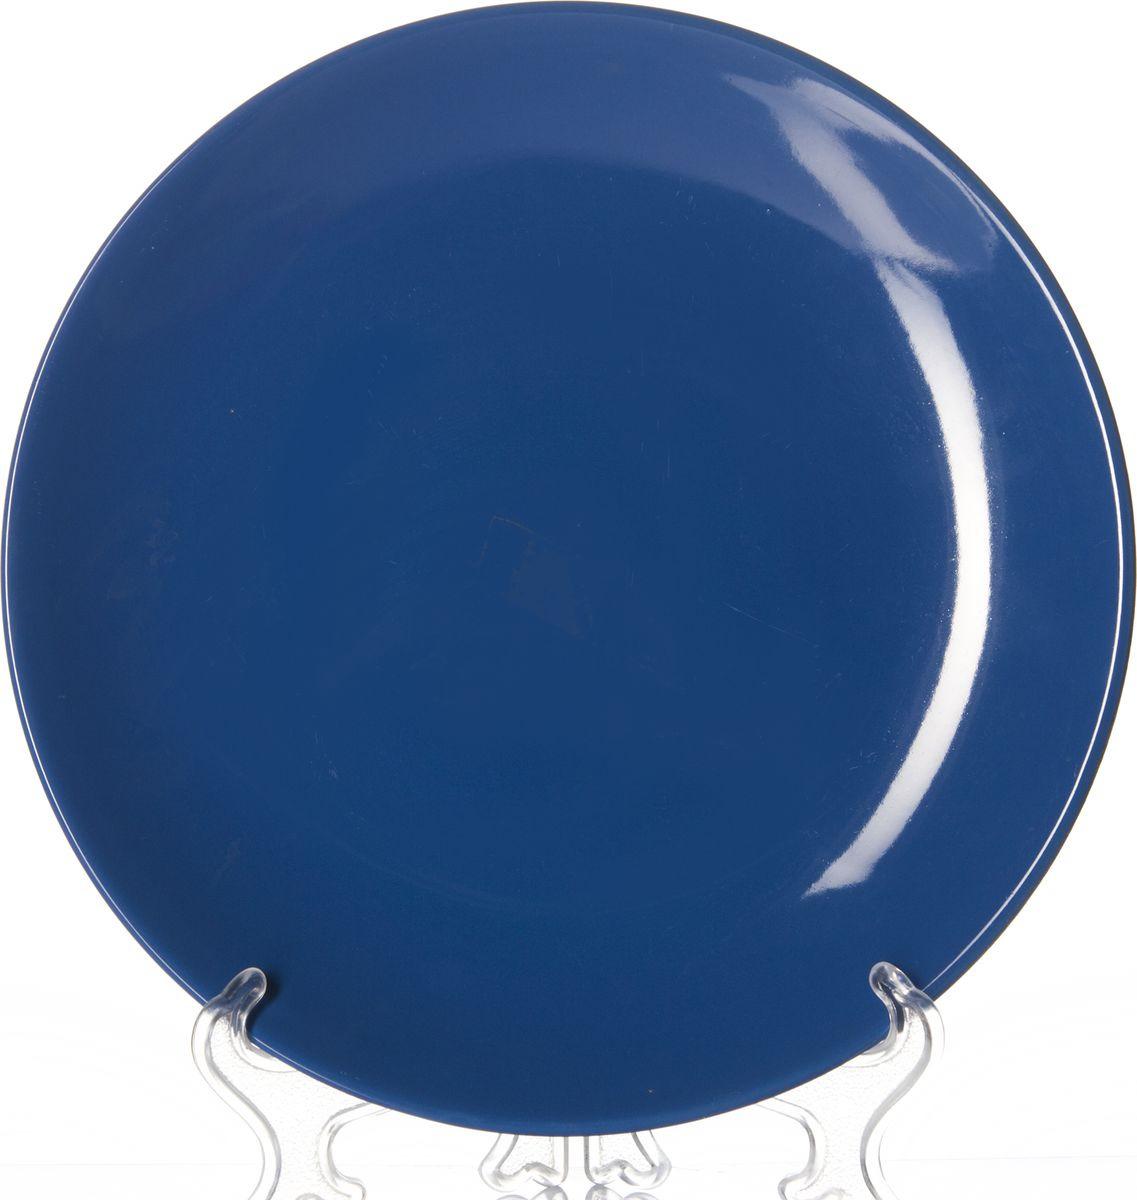 Тарелка Gotoff, 8221A, синий, диаметр 26 см тарелка gotoff цвет белый диаметр 20 5 см